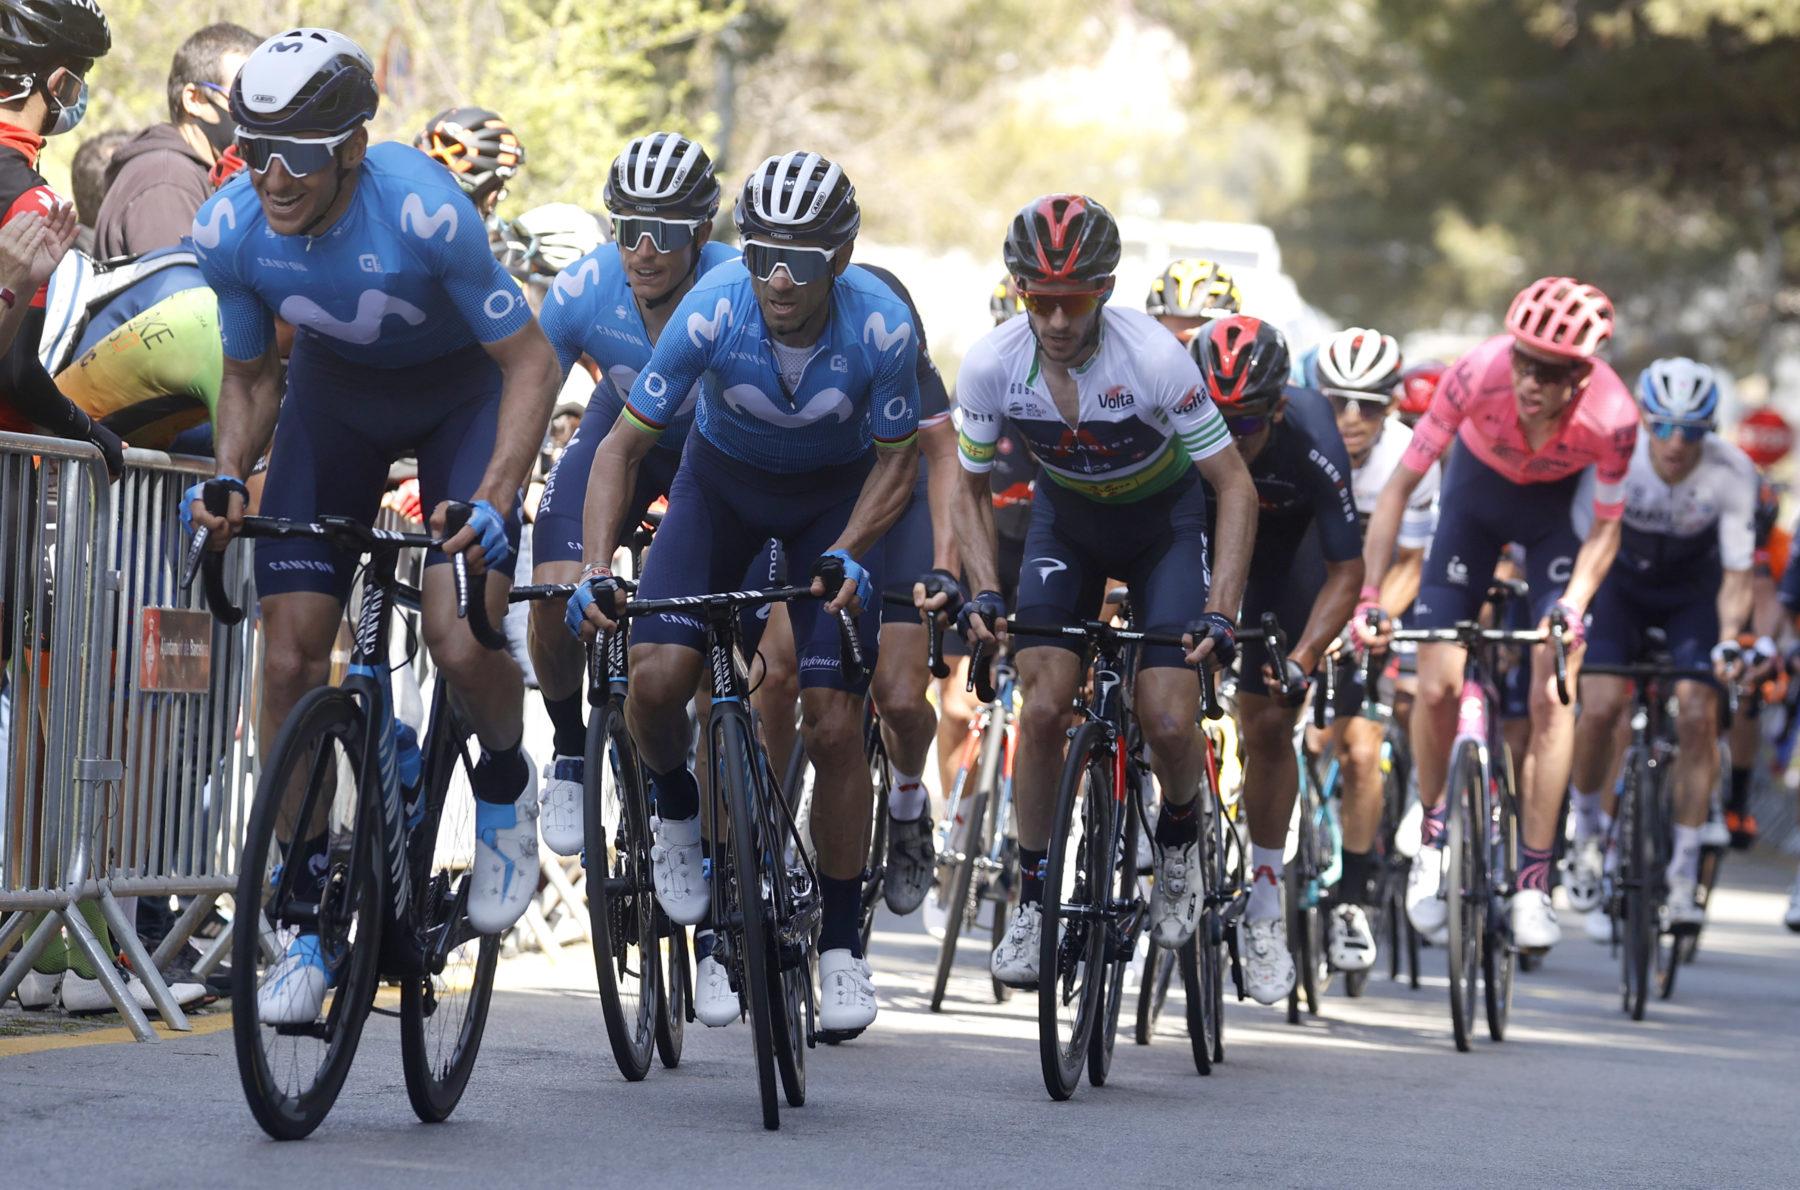 News' image'Valverde (4º) y Movistar Team pelean hasta el final en Montjuïc'